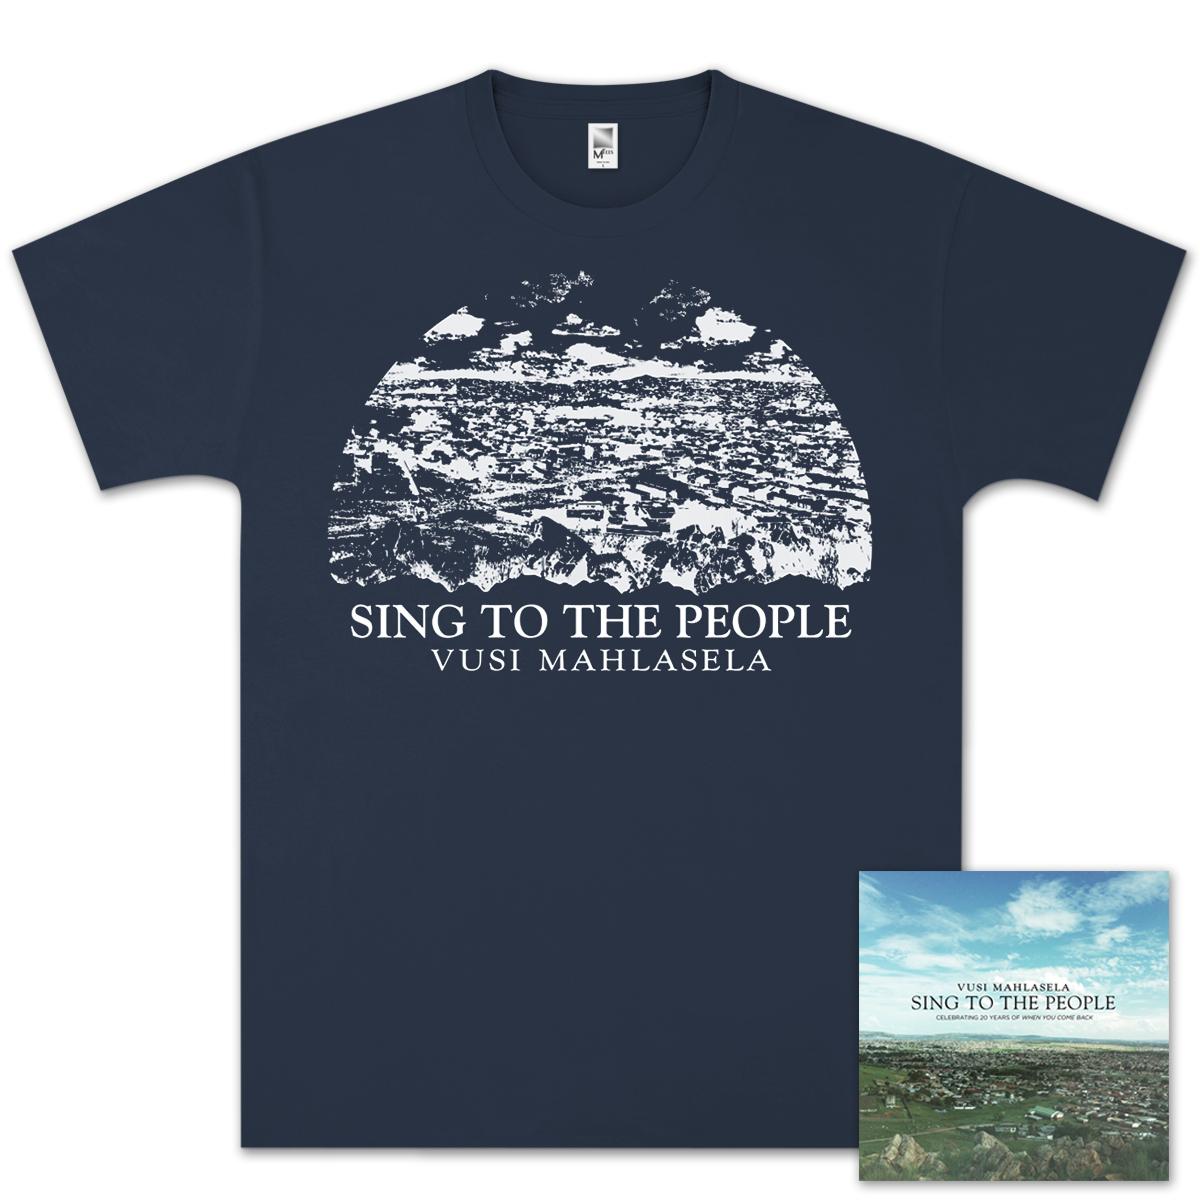 Vusi Mahlasela Sing To The People T-Shirt/CD Bundle